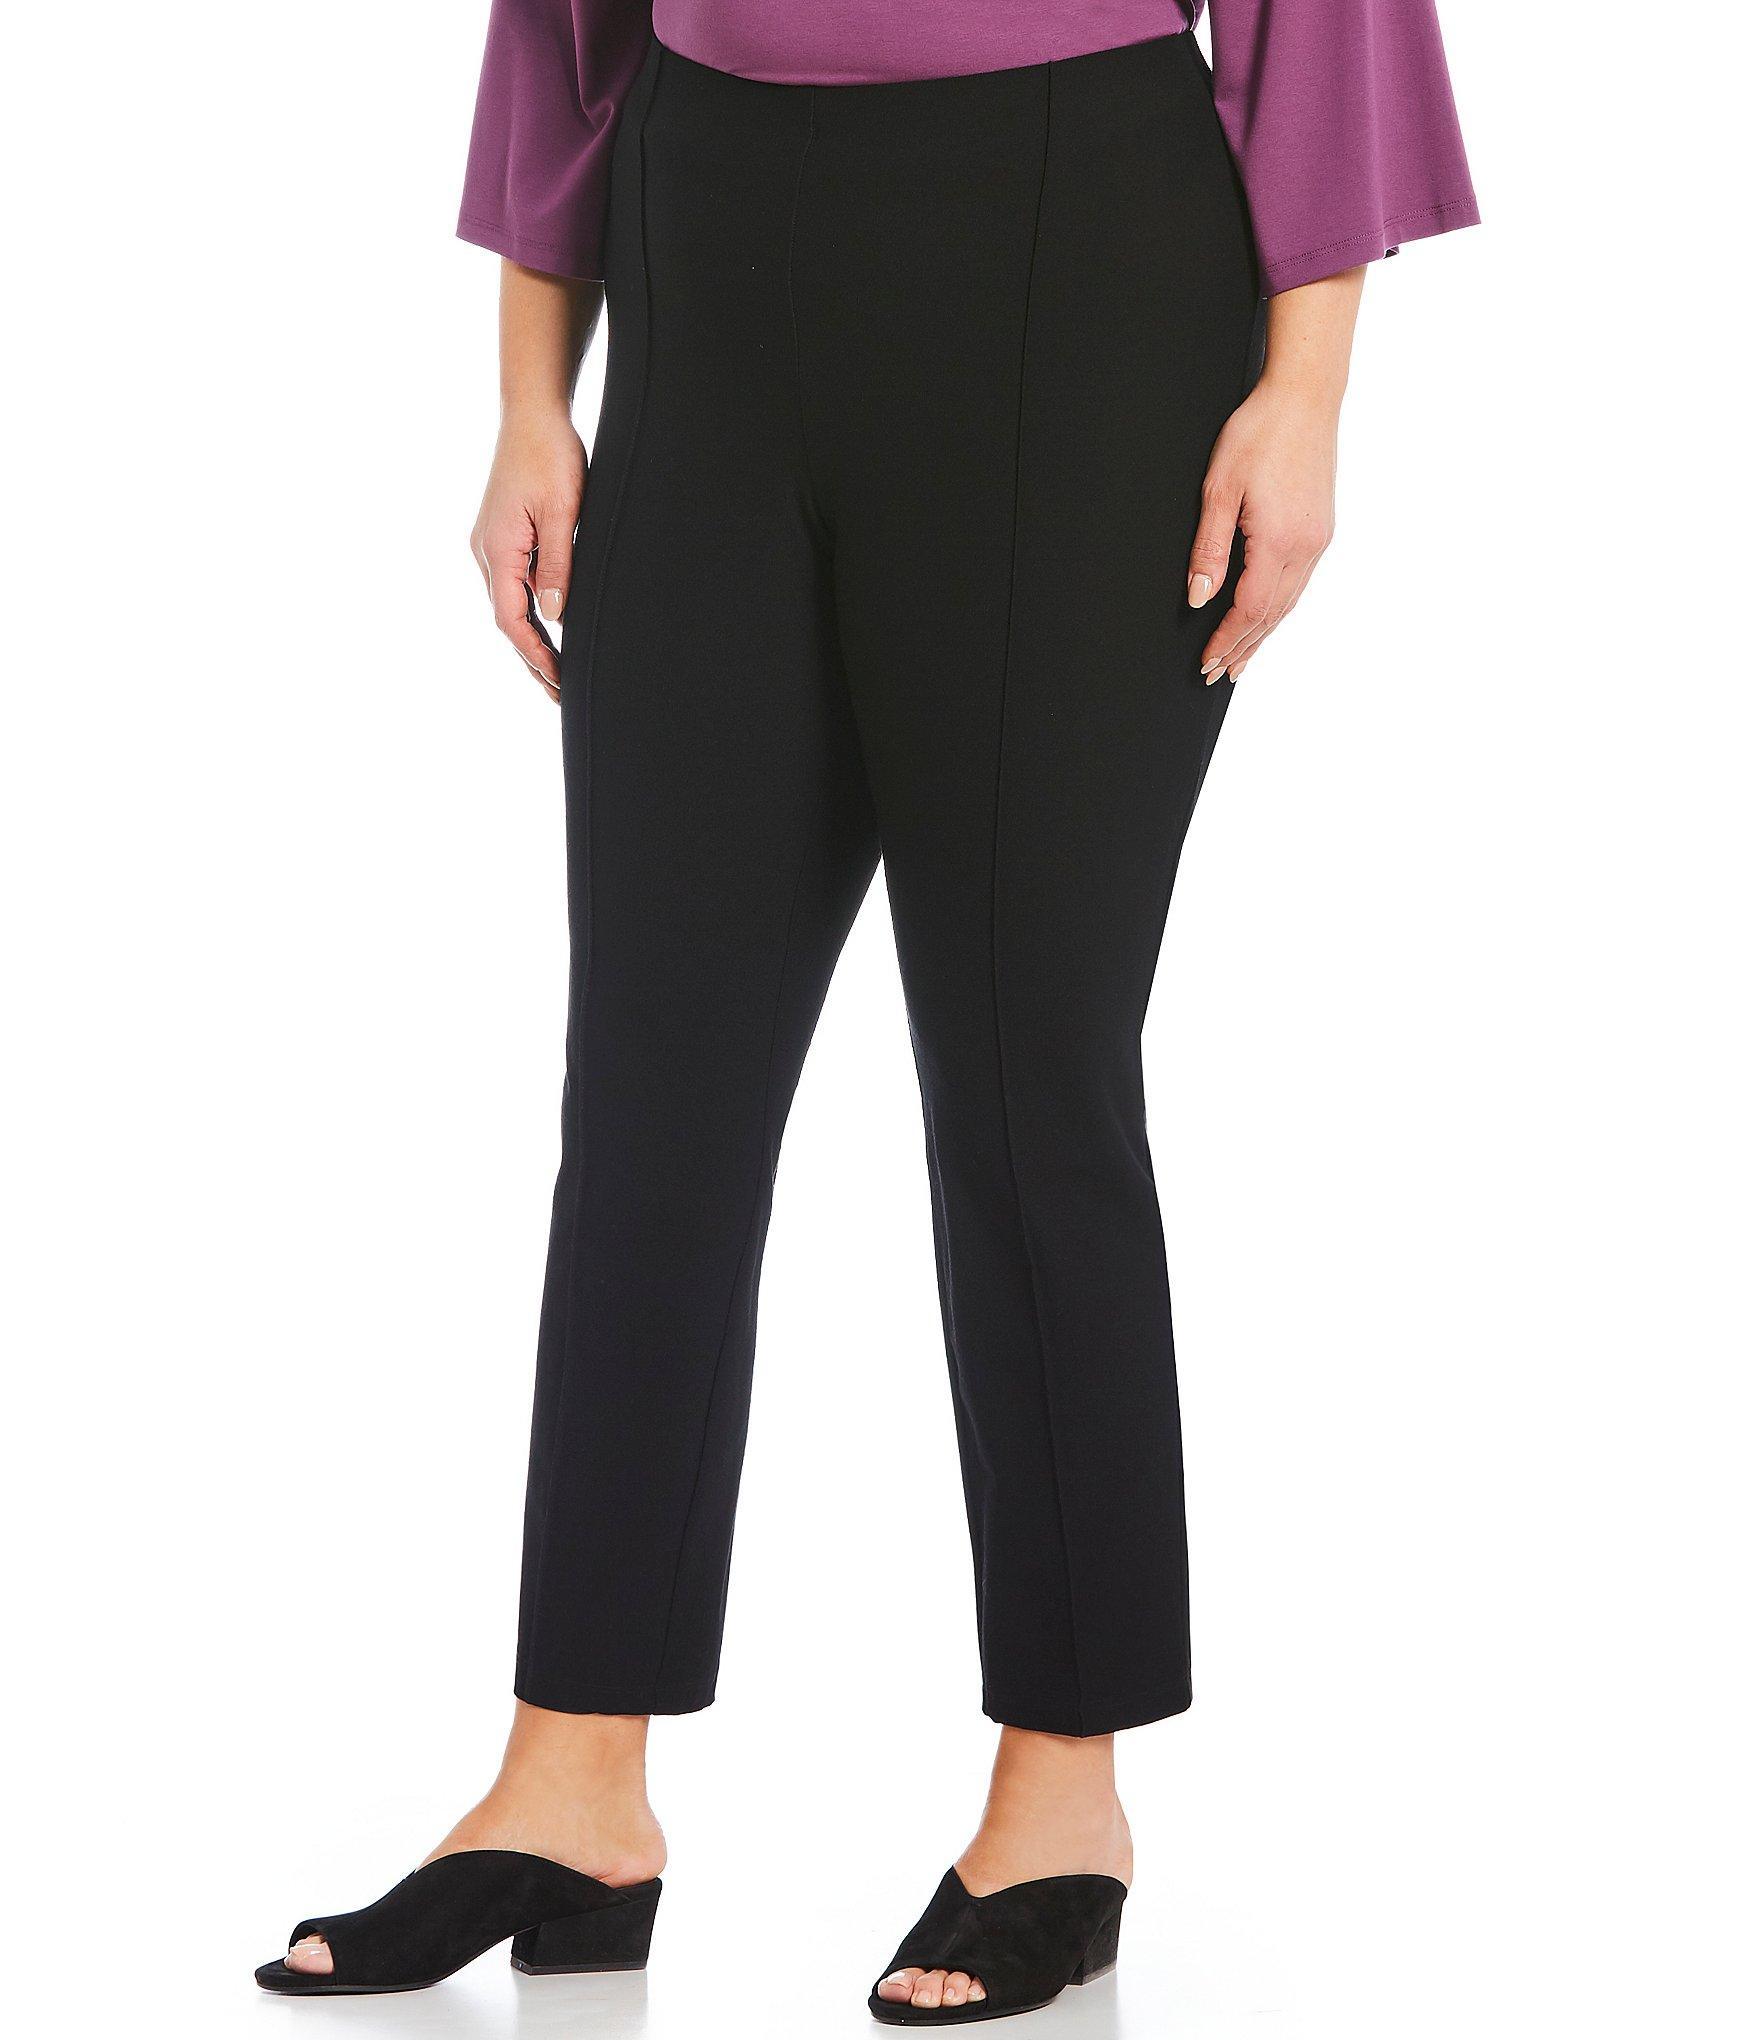 0c5e683ea80 Lyst - Eileen Fisher Plus Size High Waist Slim Ankle Pants in Black